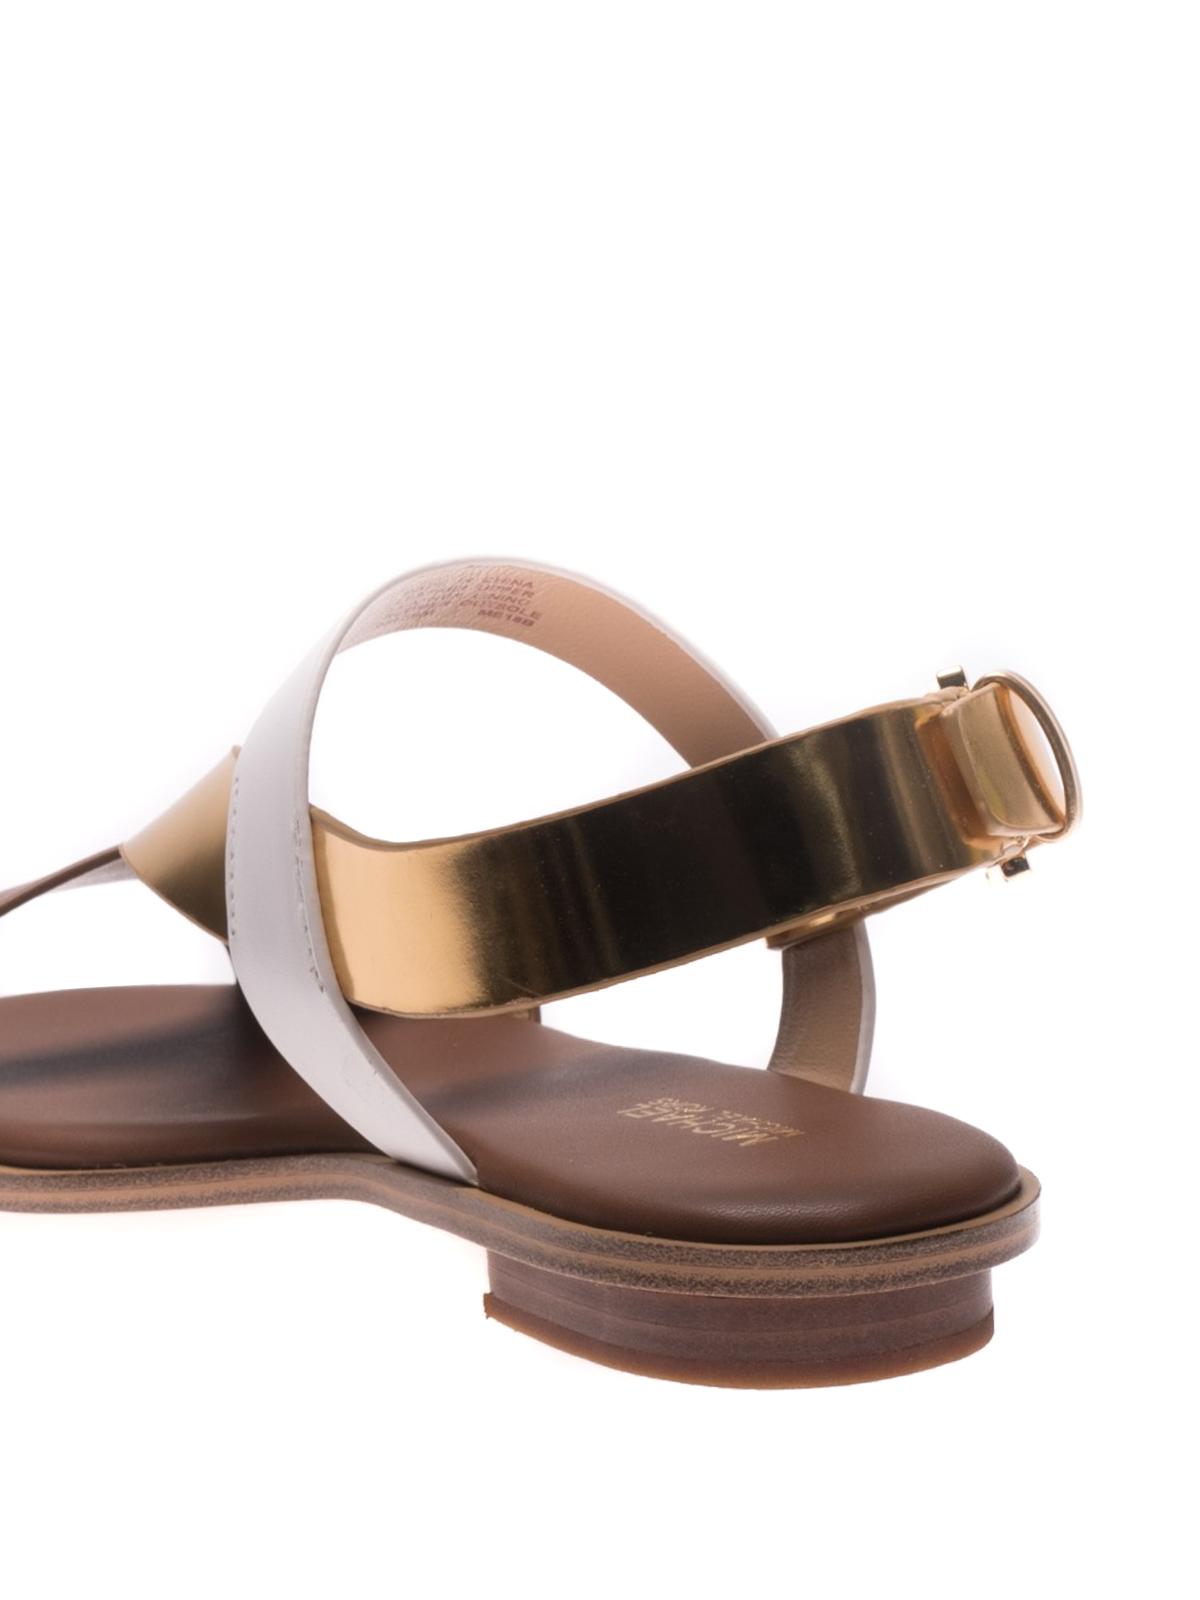 311e3eece3 Michael Kors - Mackay leather sandals - sandals - 40S8MCFA2L 231